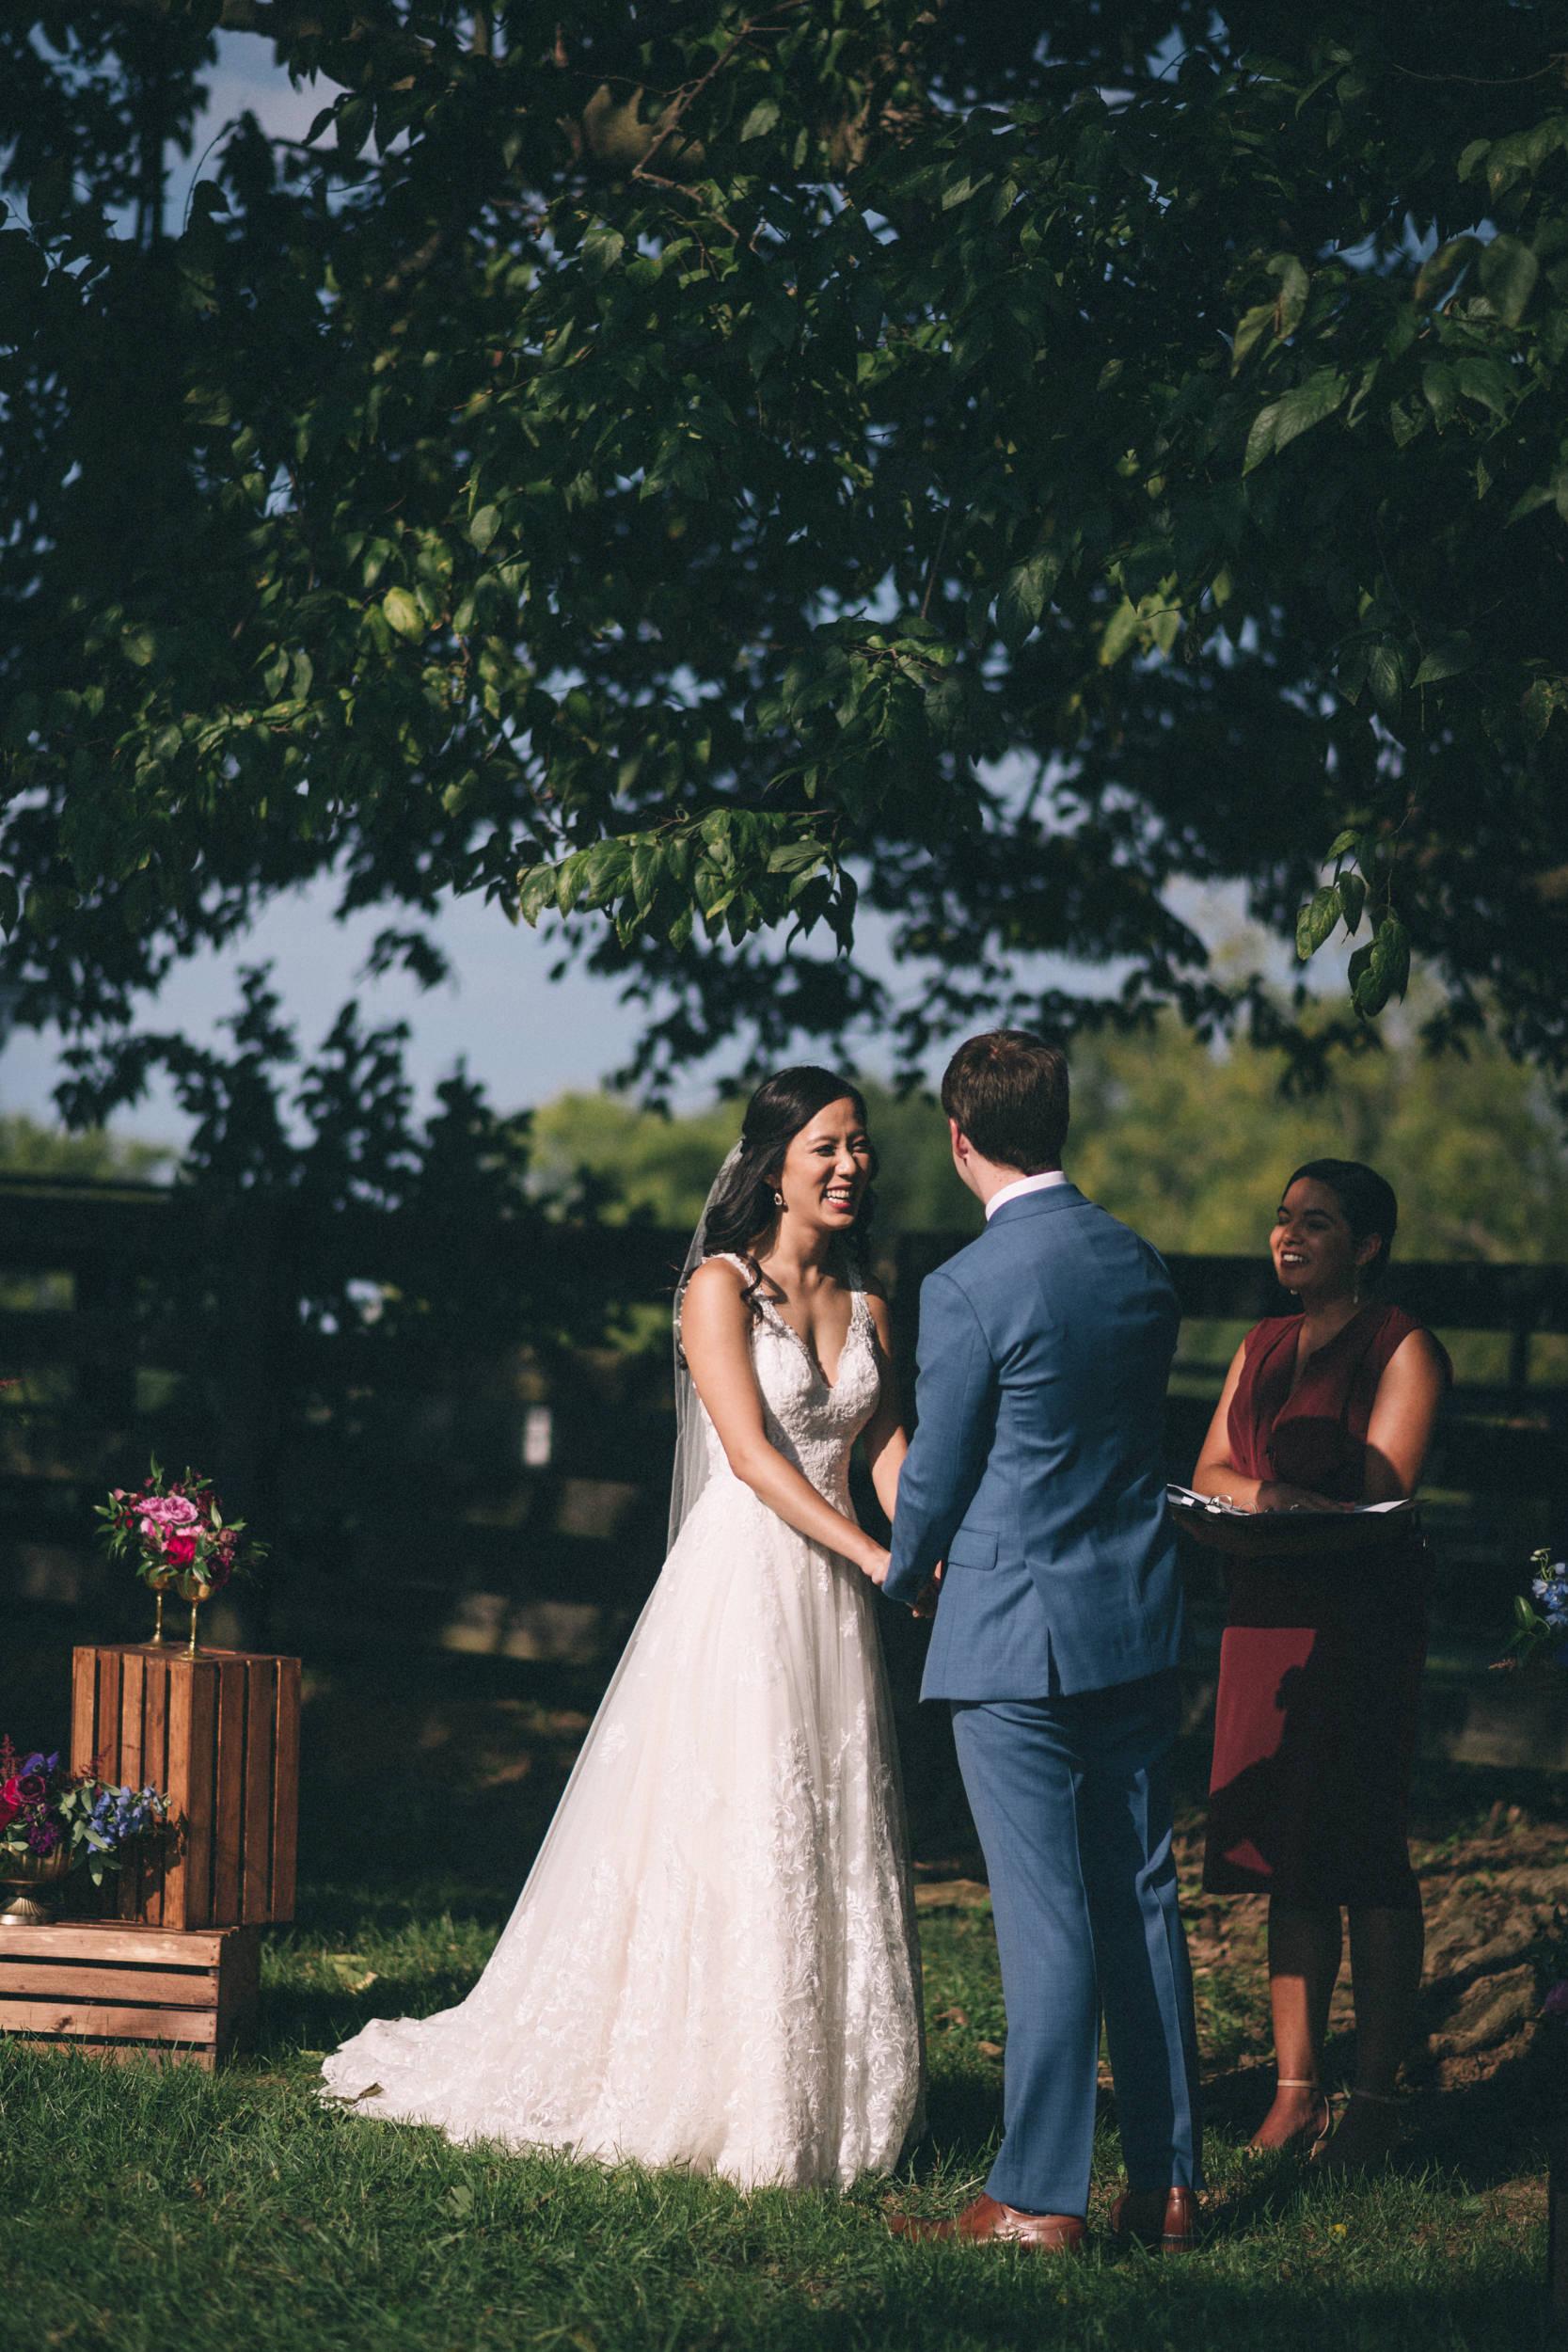 Louisville-Kentucky-Wedding-and-Elopement-Photographer-Sarah-Katherine-Davis-Photography-Summer-Jewel-Toned-Wedding-Chineese-Tea-Ceremony-Warrenwood-Manor-Danville-525.jpg